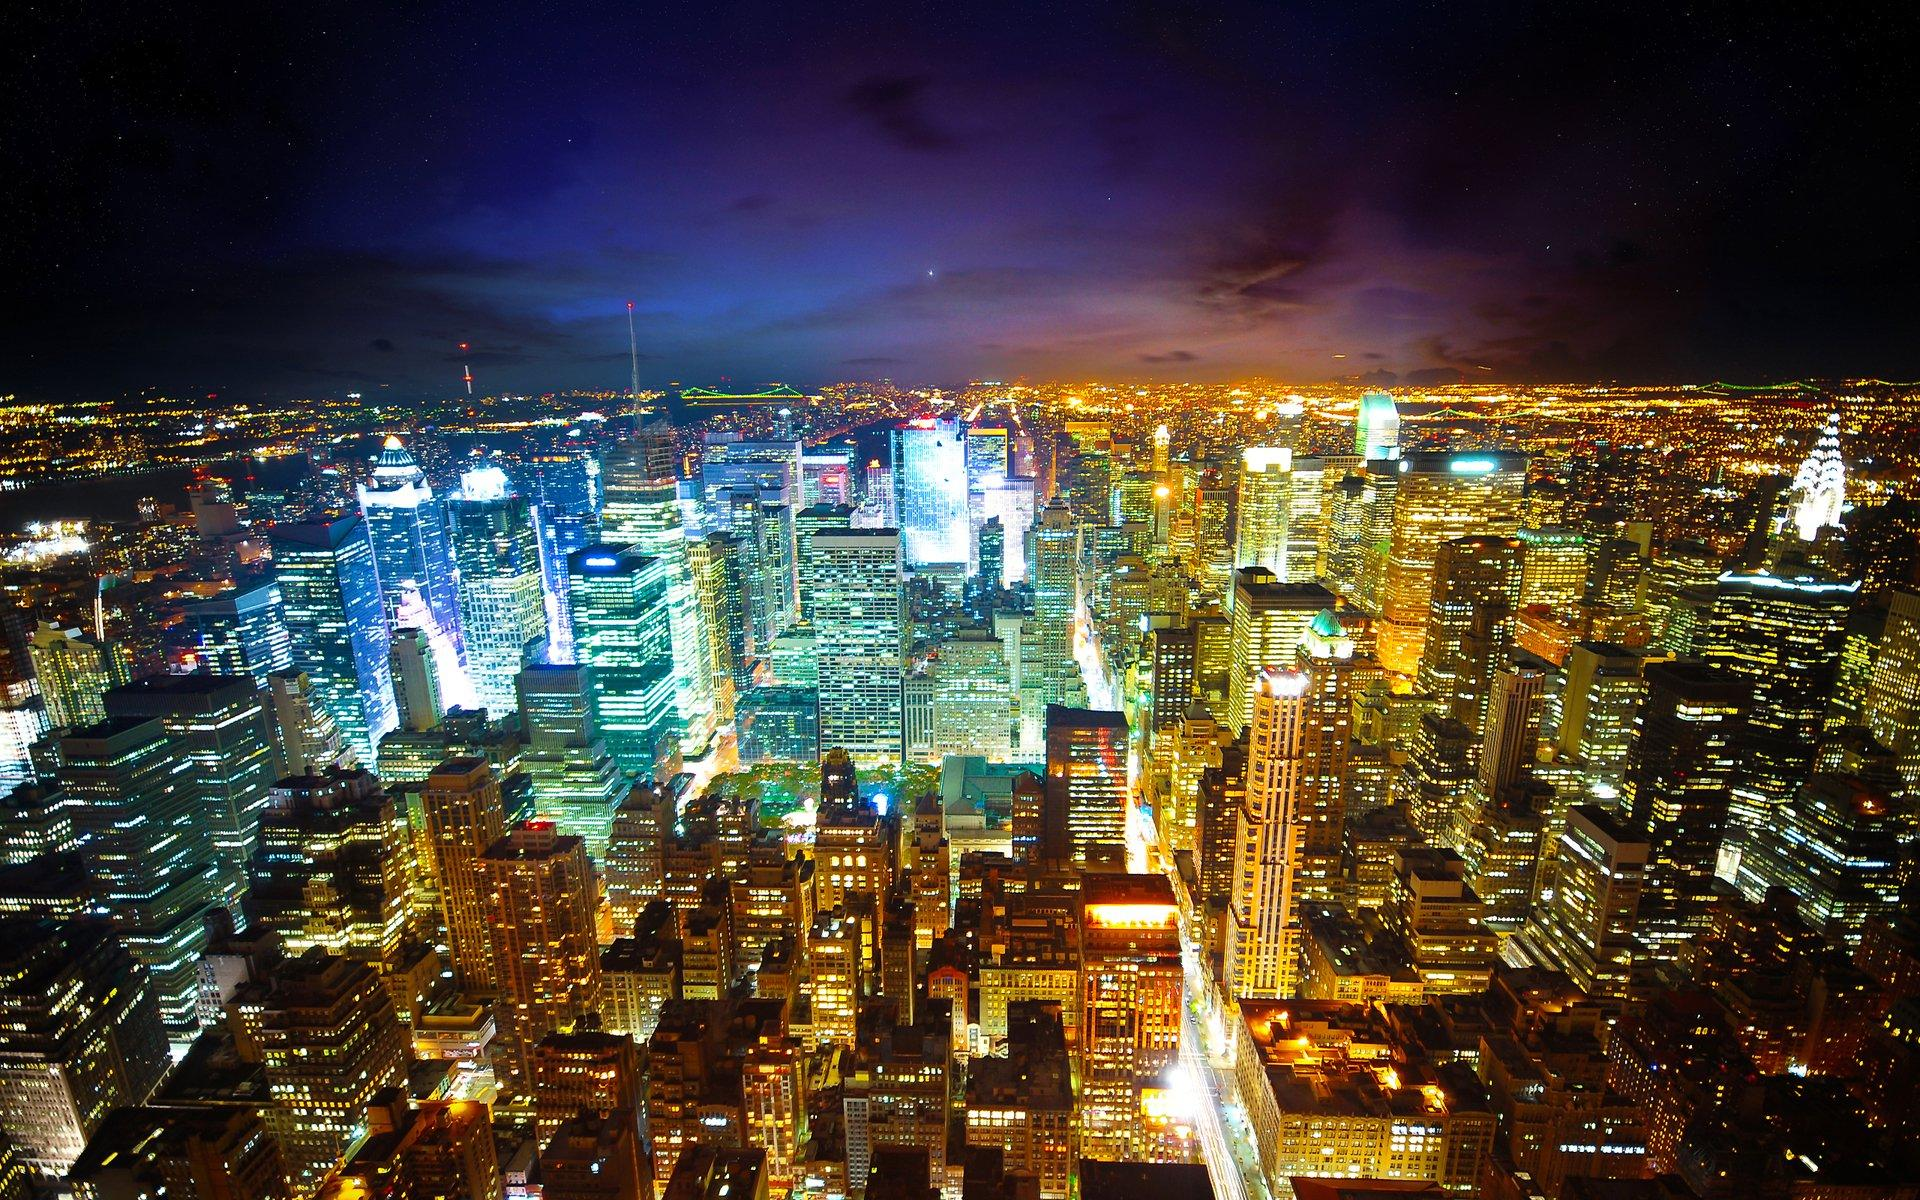 Night City Wide 1920x1200 1920x1200